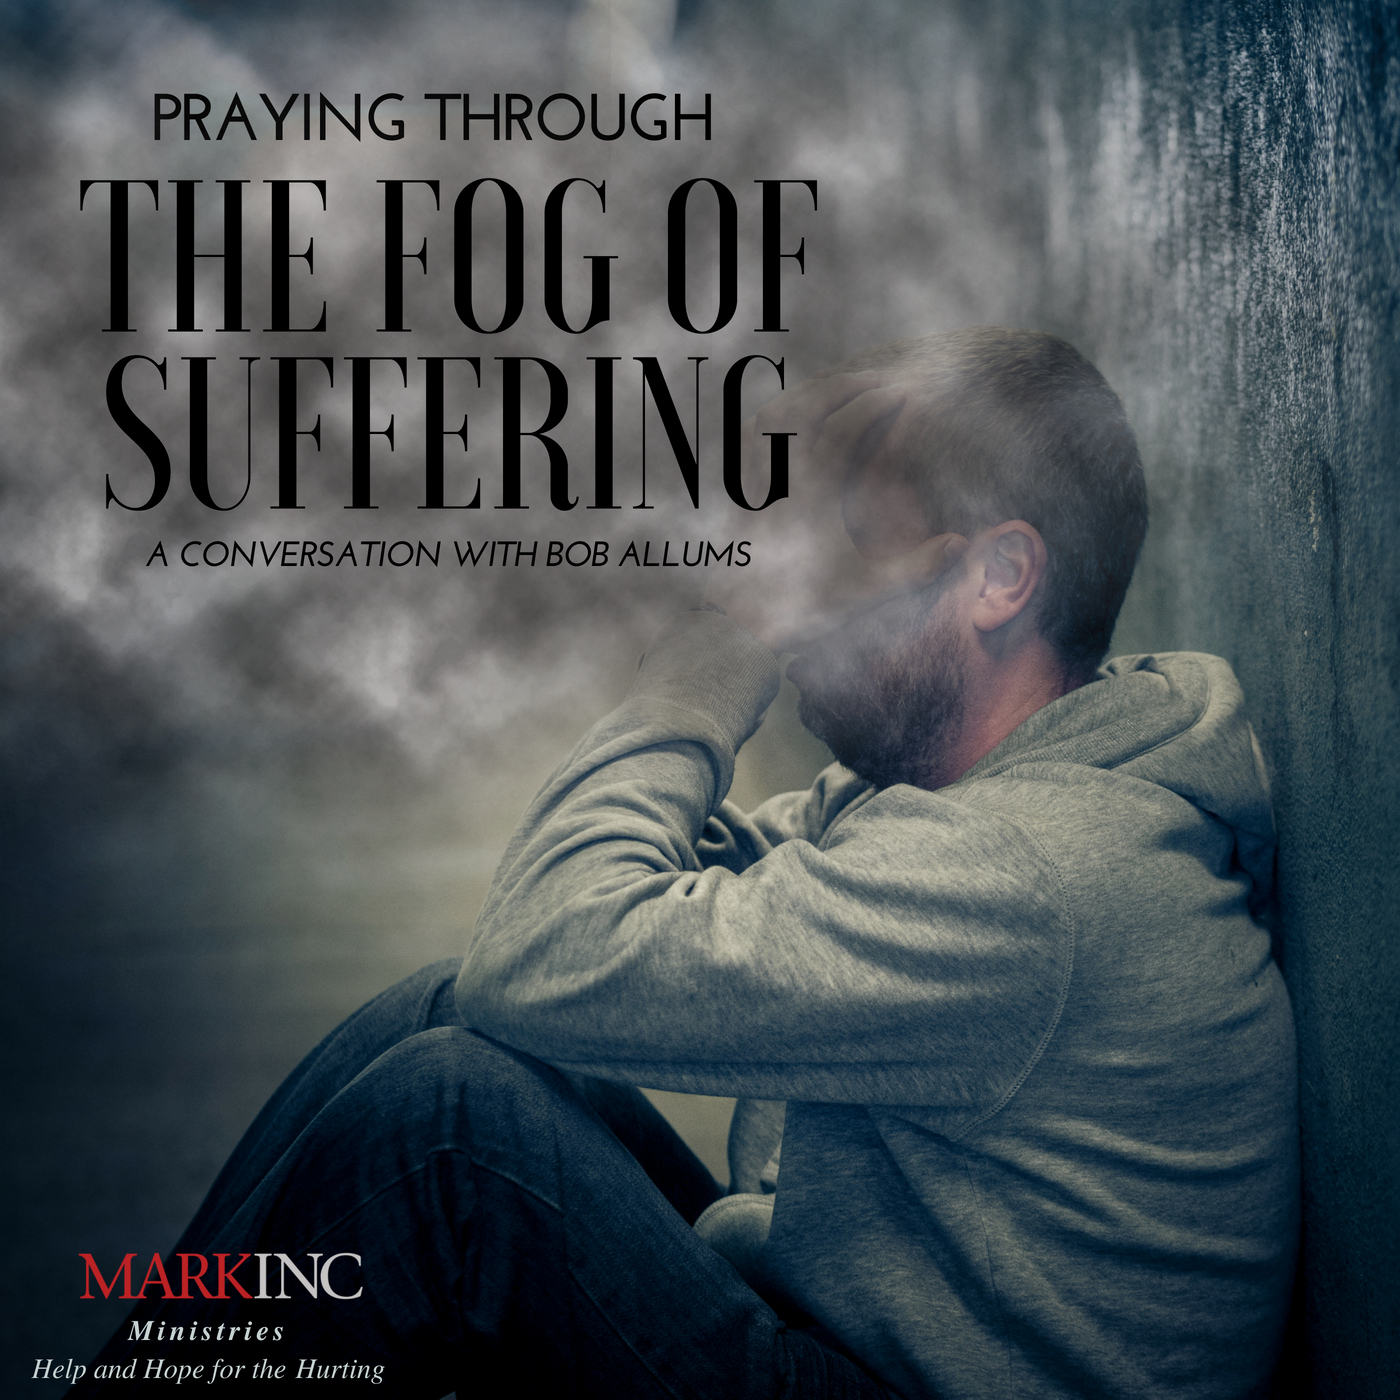 H&H Praying through the fog of suffering Bob Allums.jpg